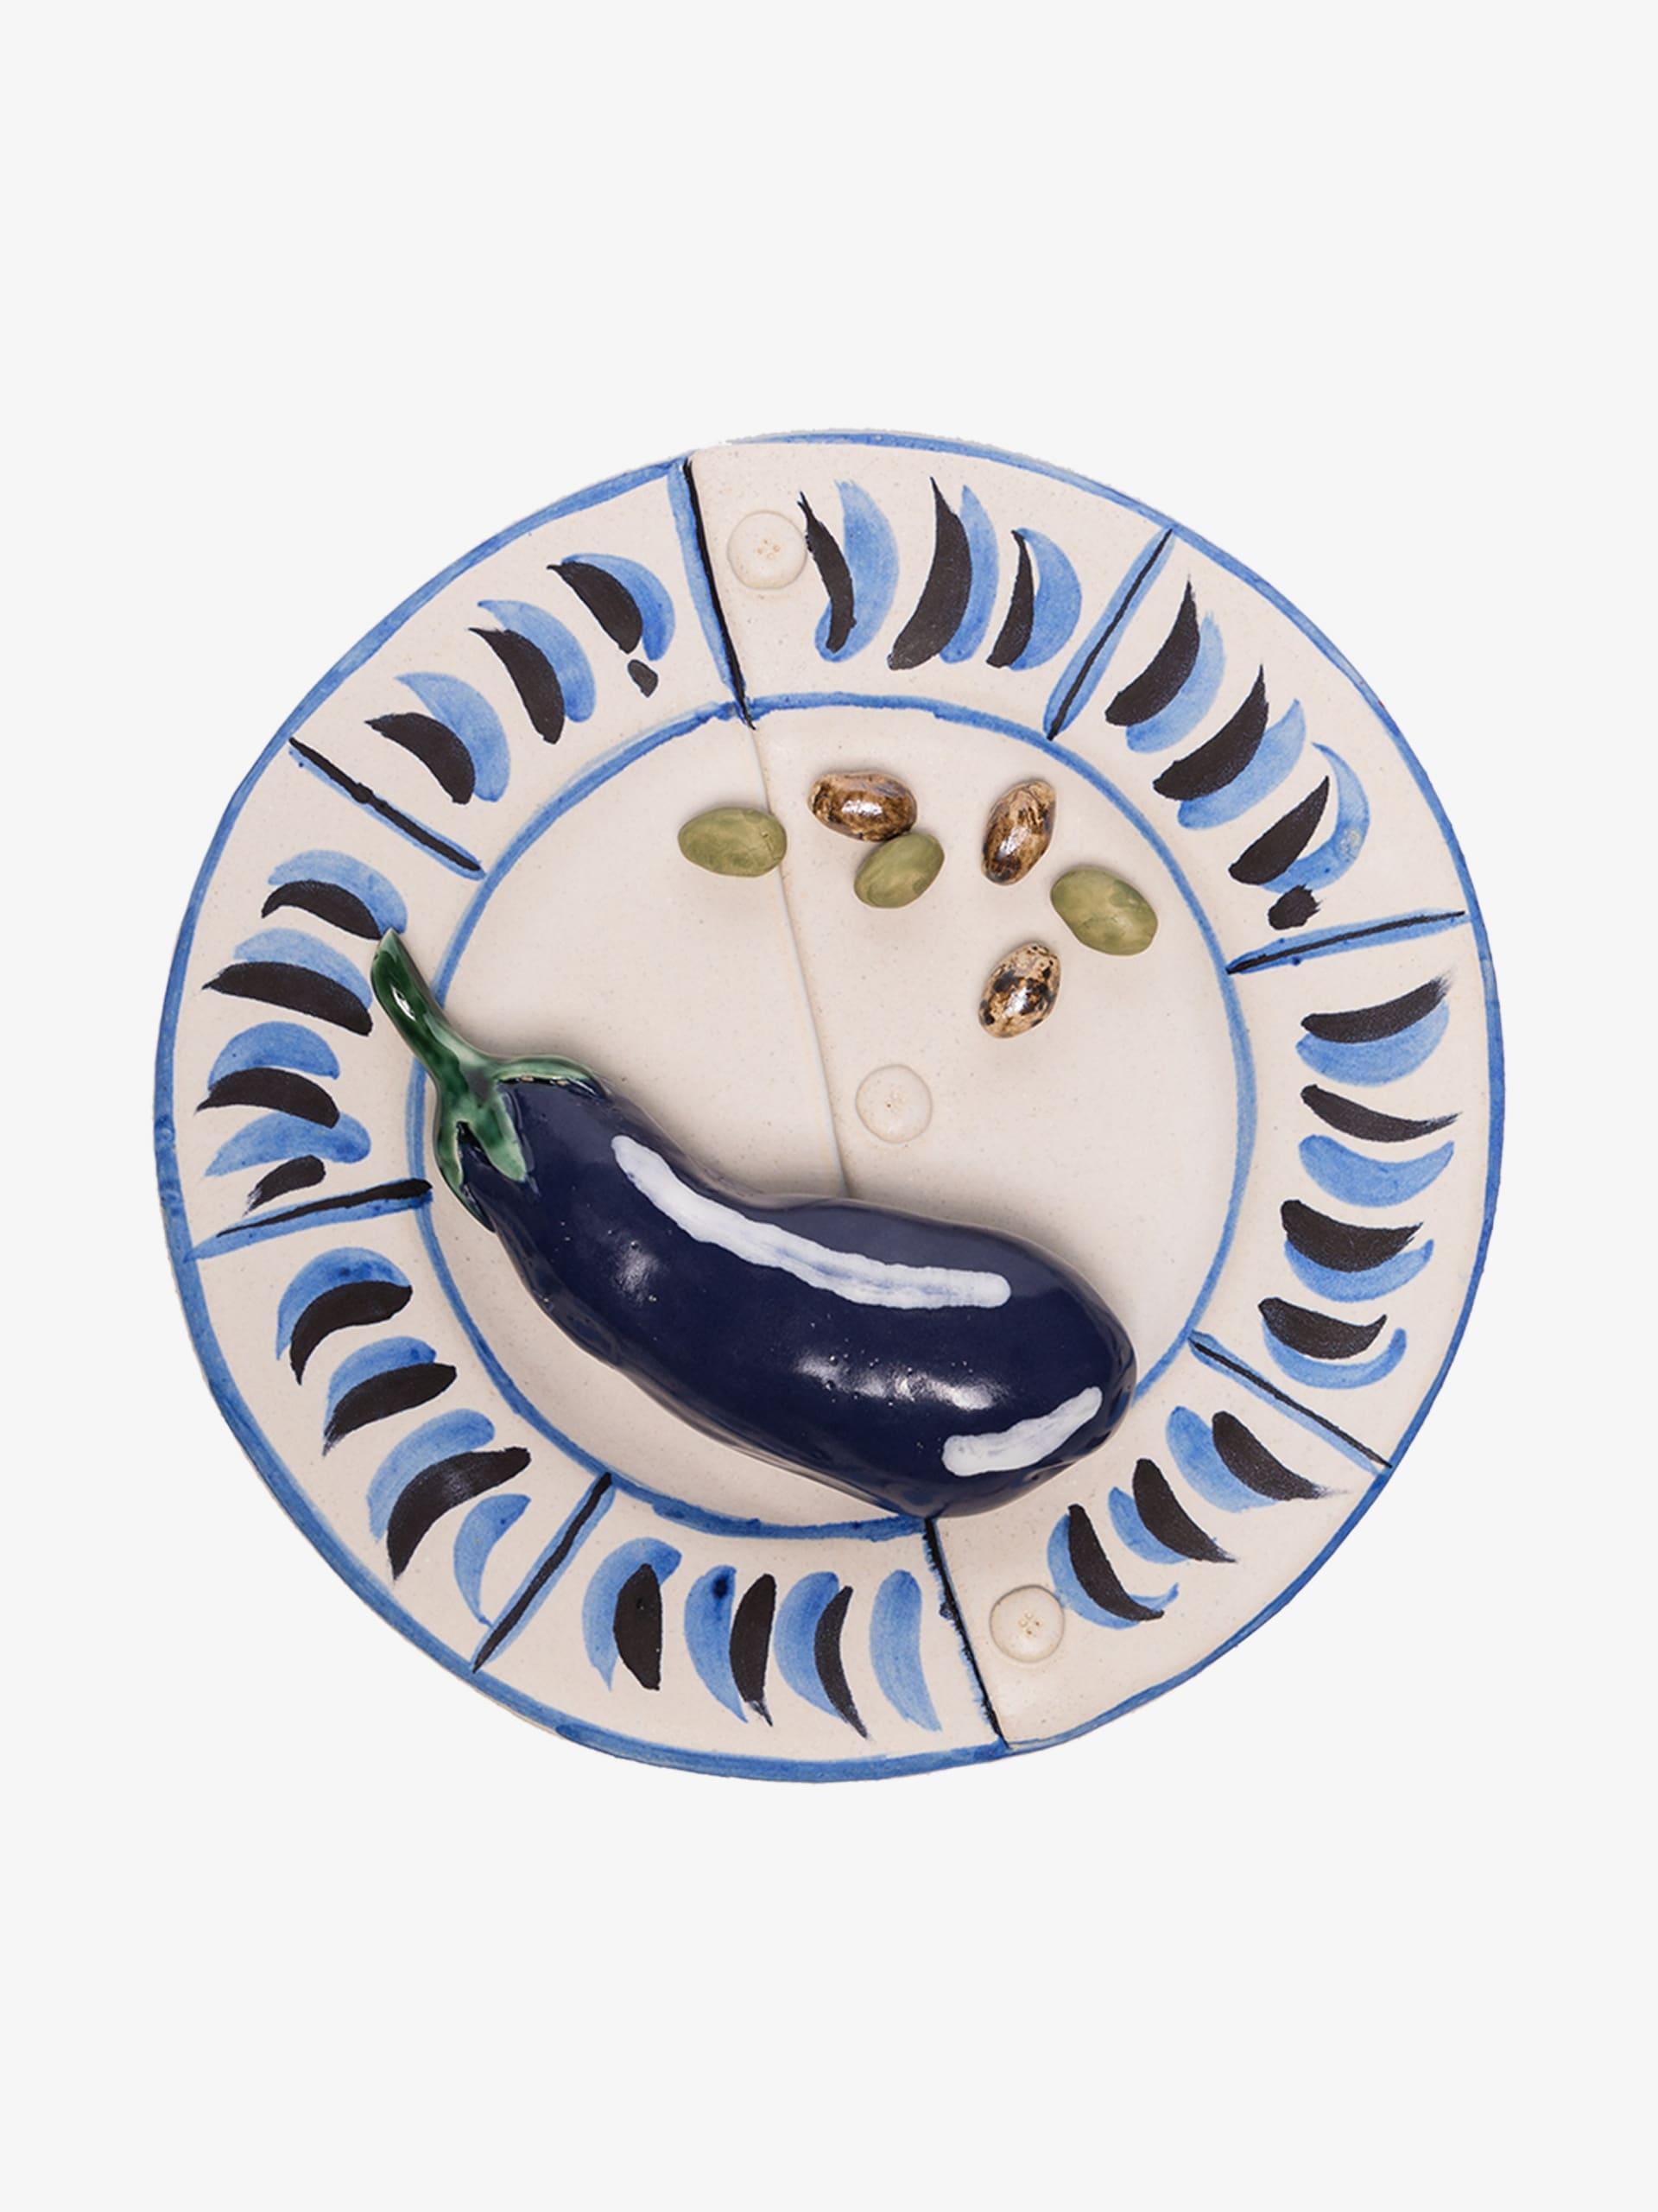 jacquemus-x-daphne-leon-multicoloured-shirt-plate_15569010_28396913_1920